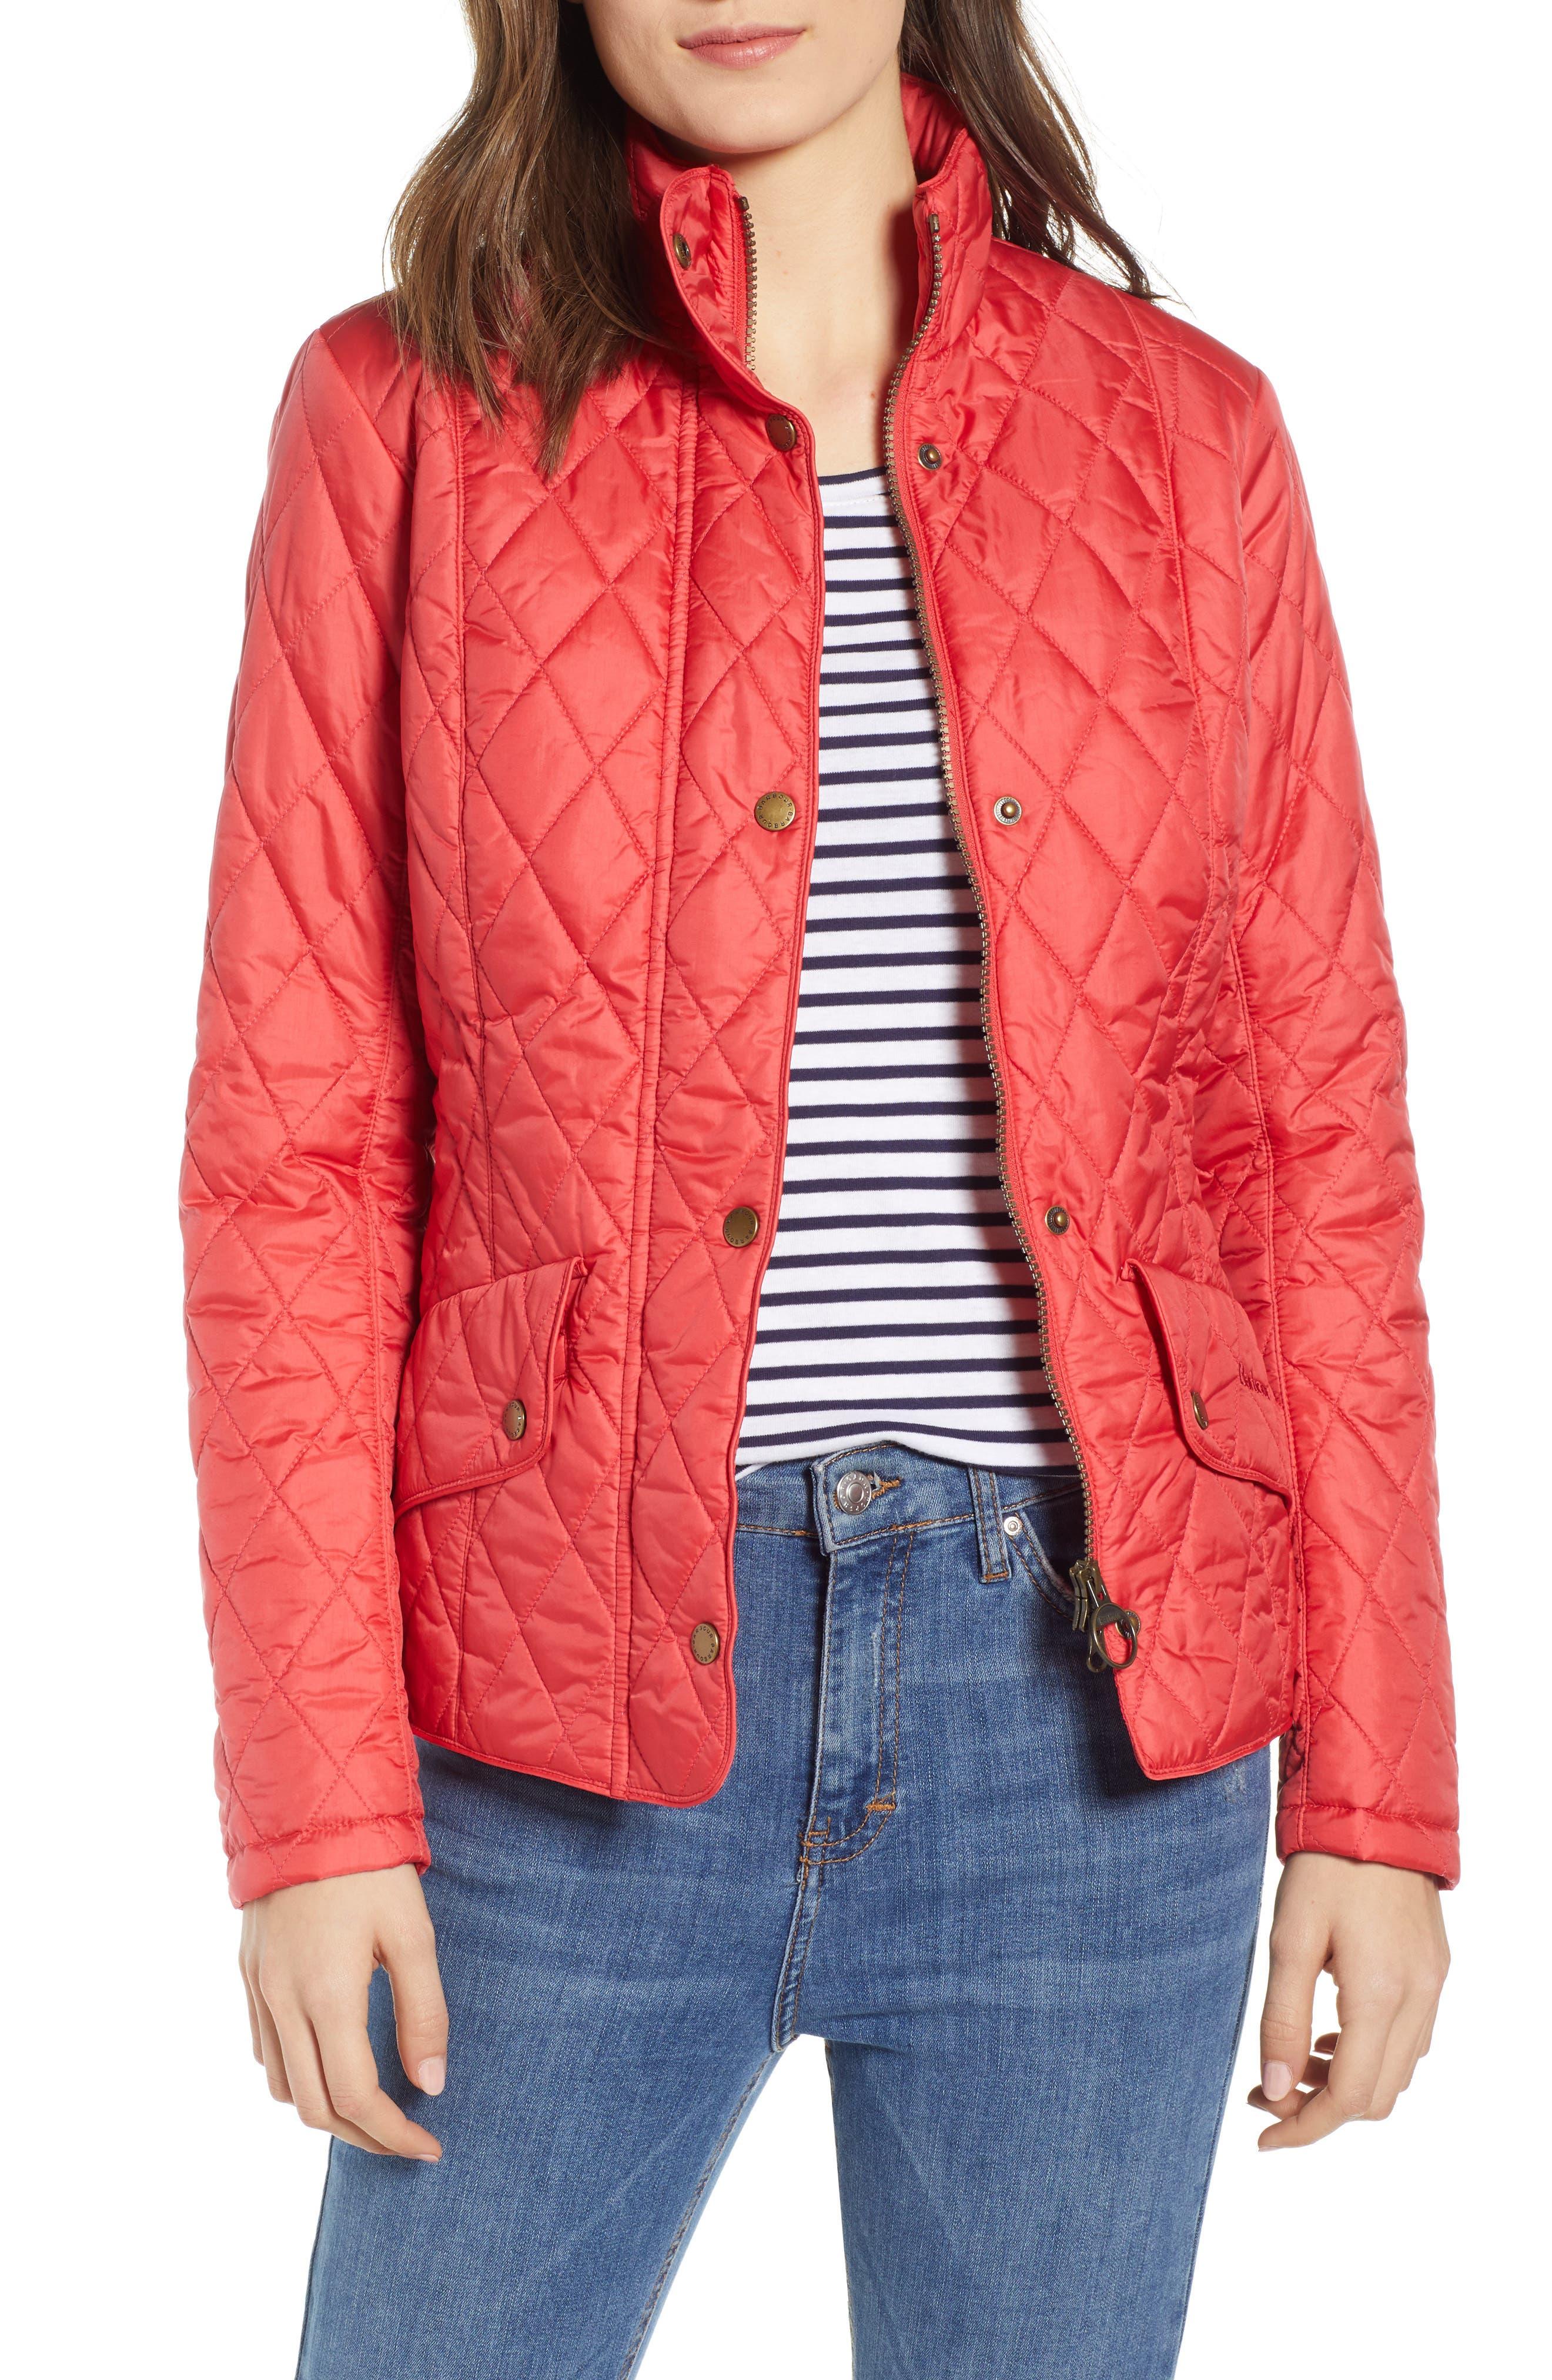 Barbour Cavalry Flyweight Quilt Jacket, 18 UK - Red